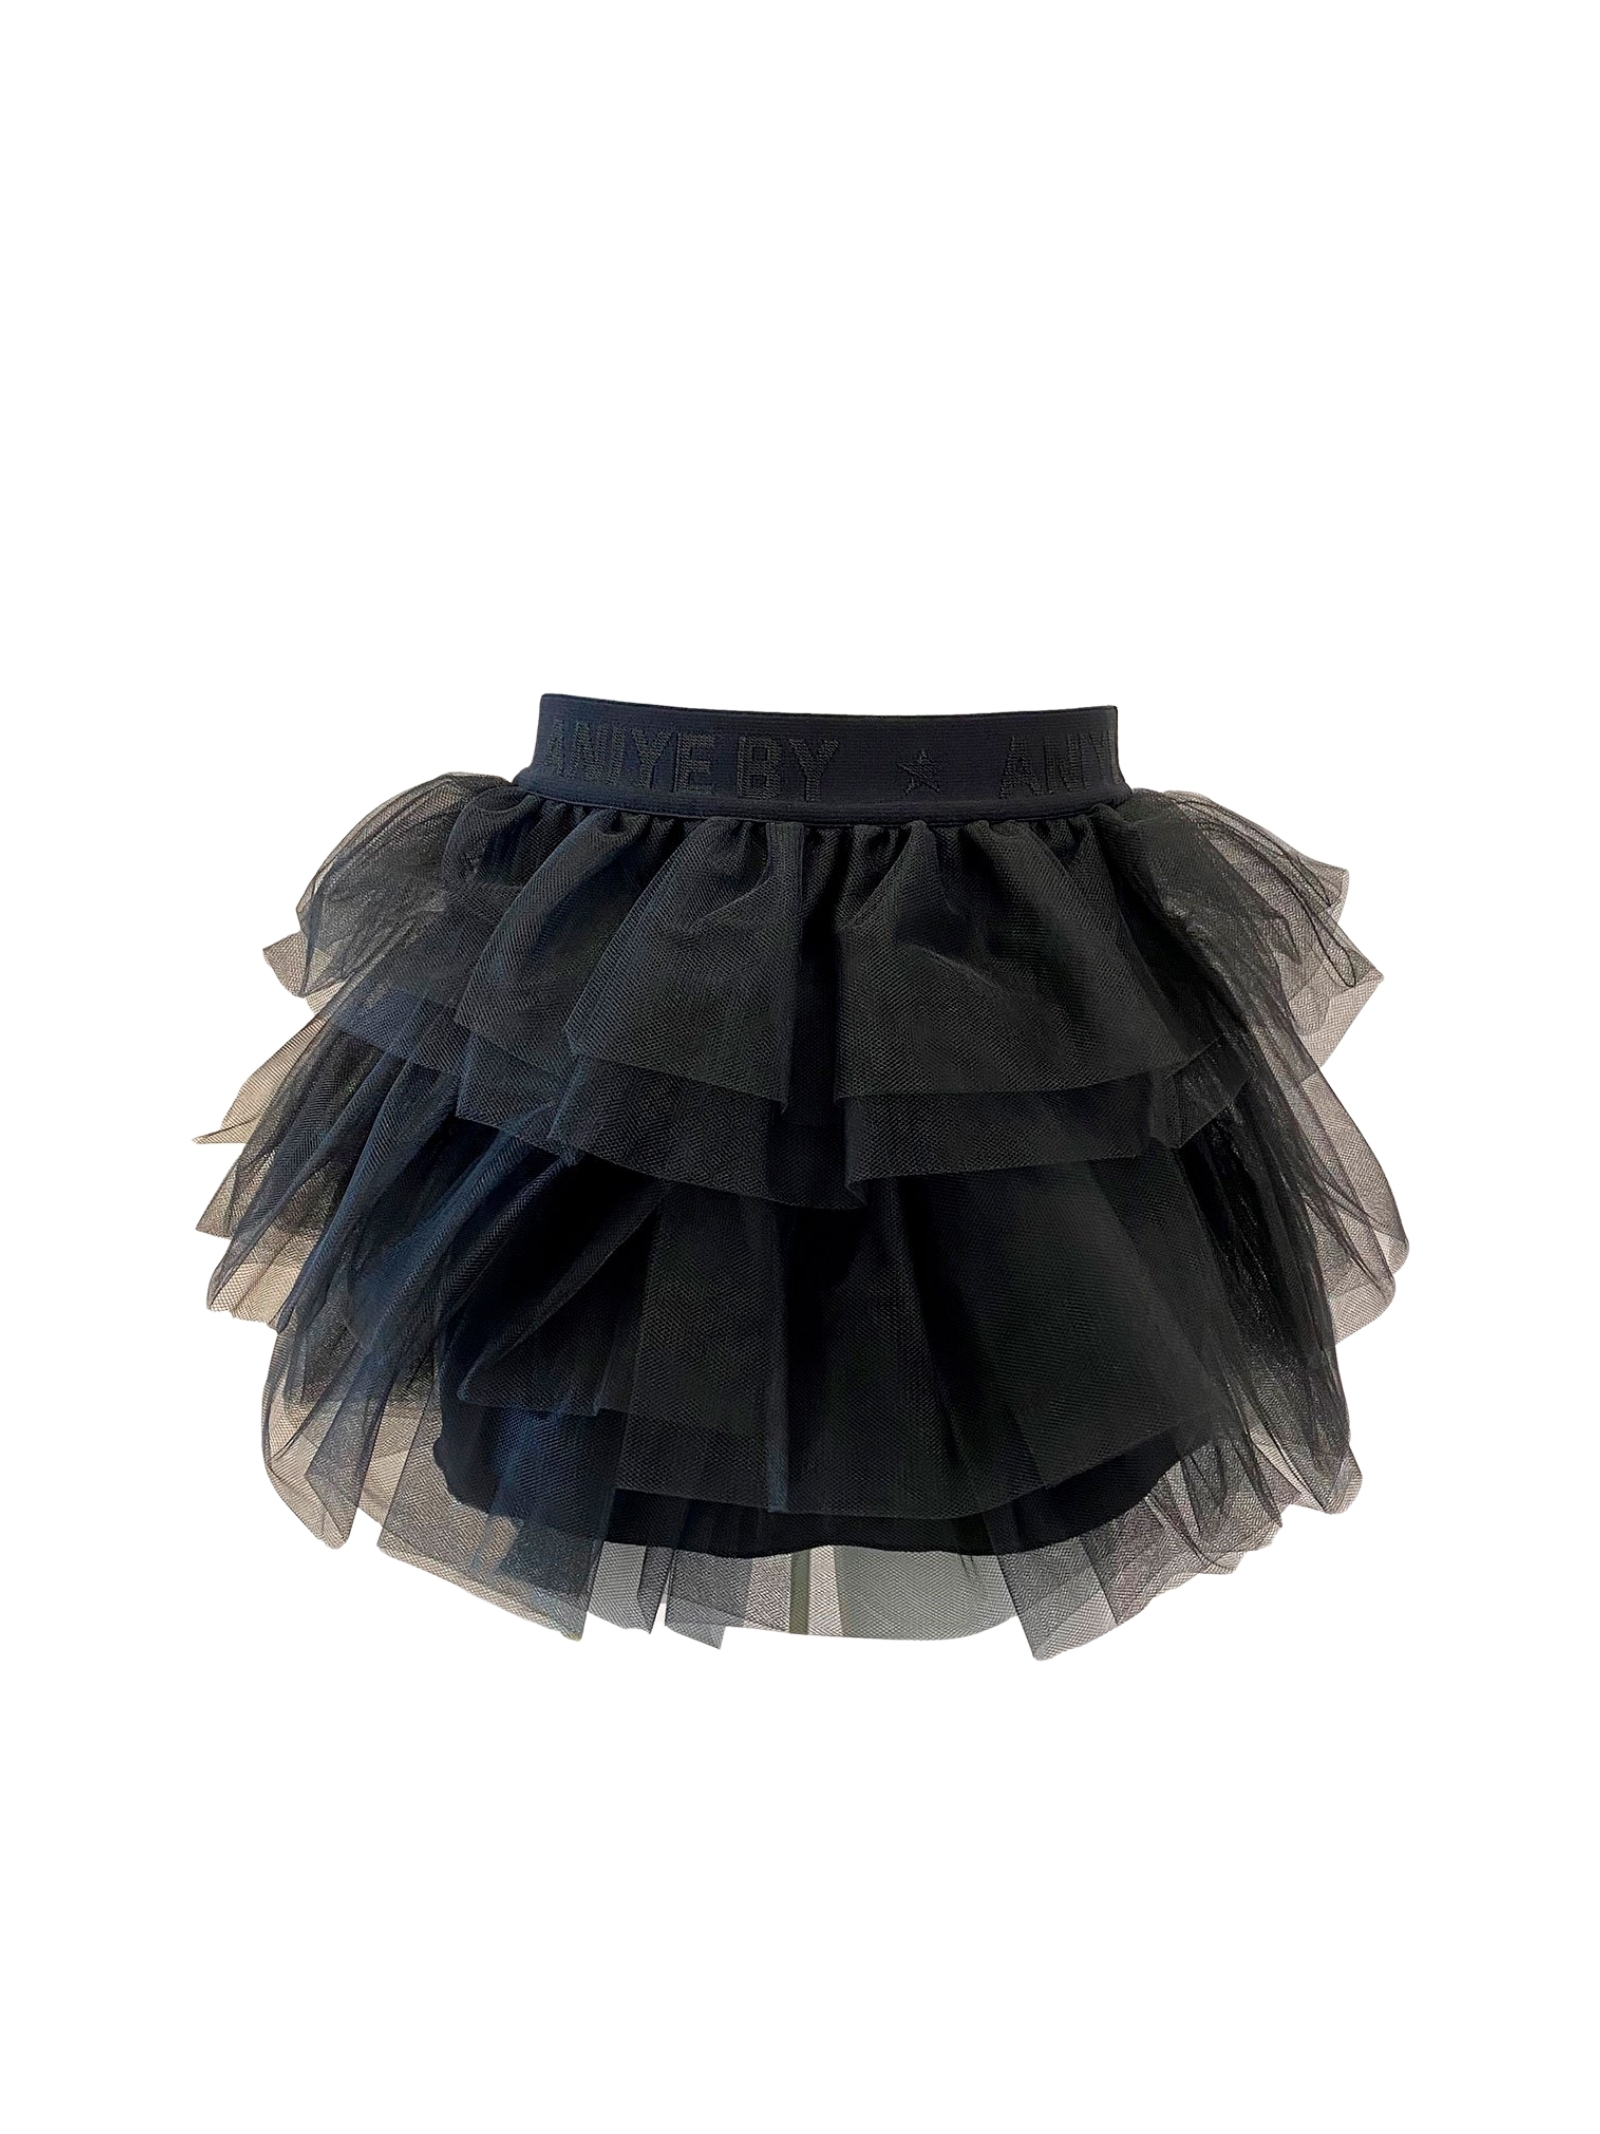 Tulle Skirt with Logo for Girls ANIYE BY GIRL | Skirts | 11125200336